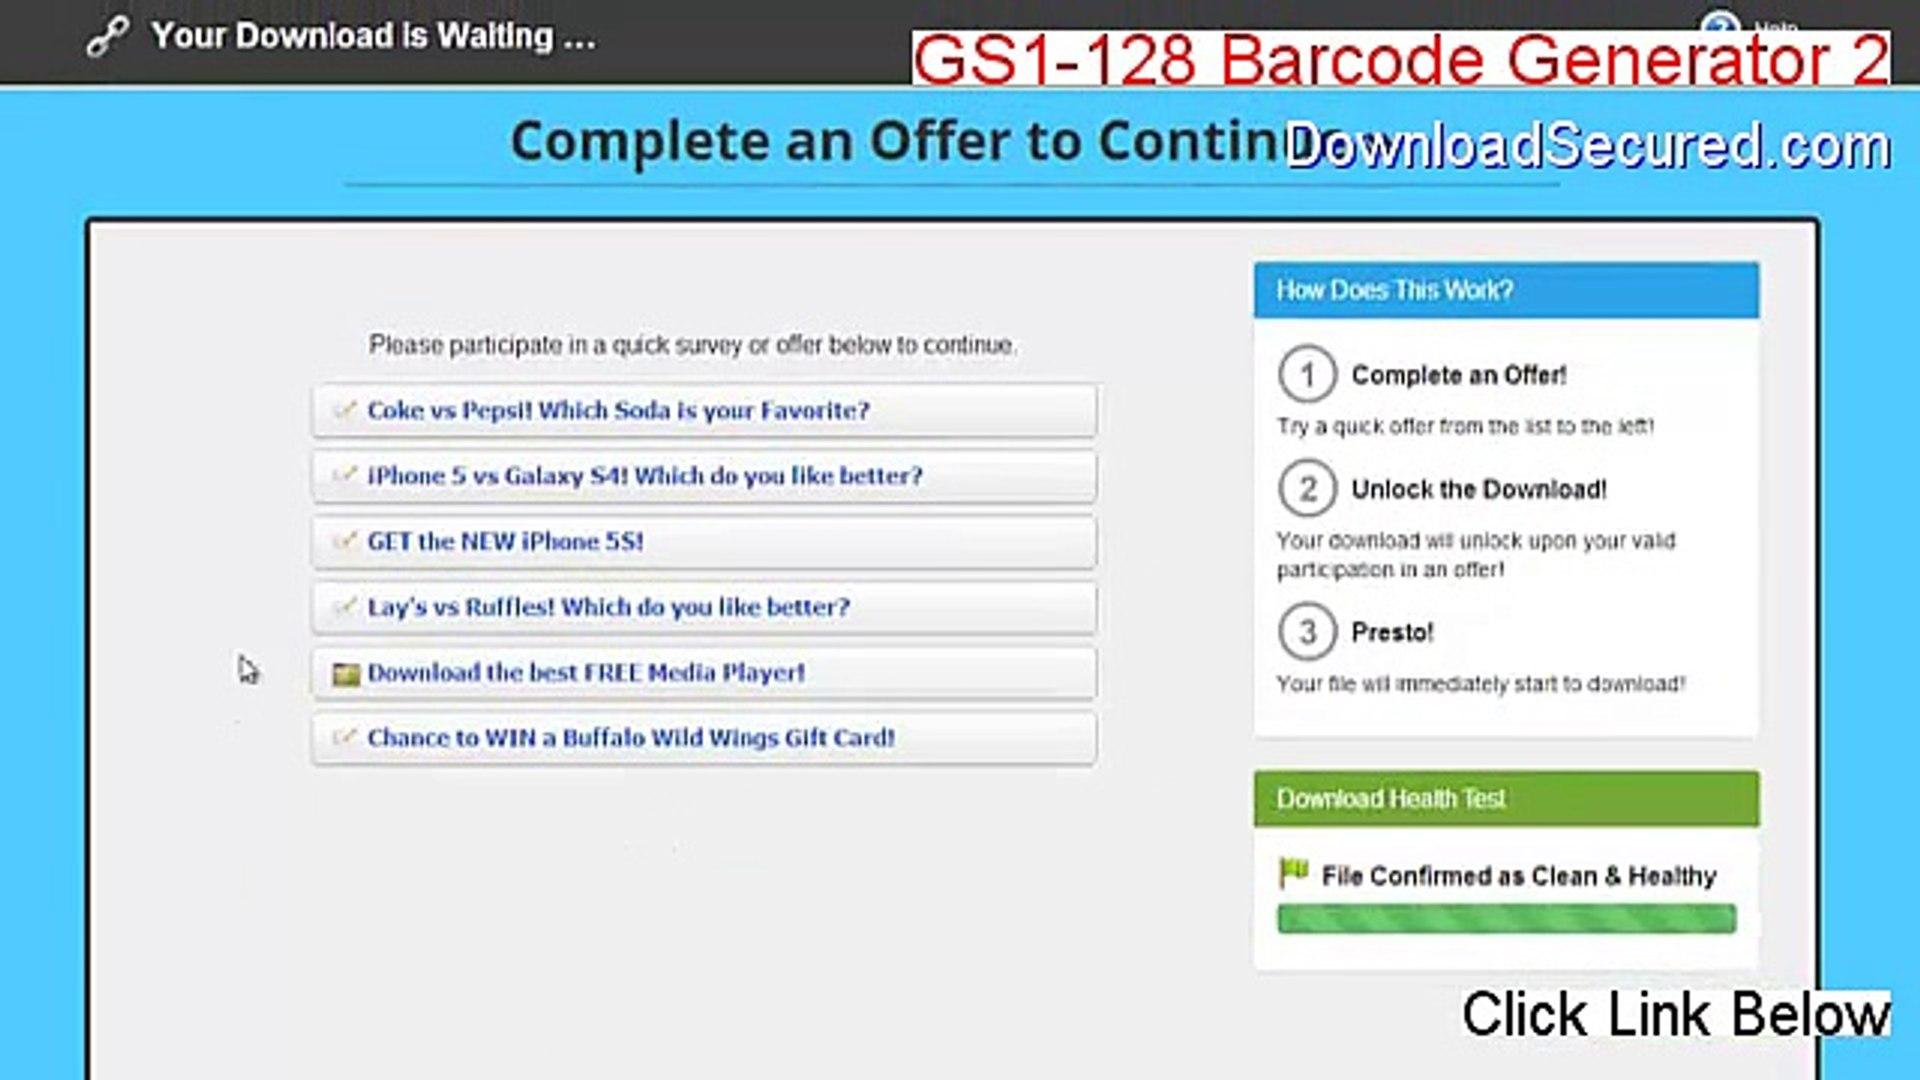 GS1-128 Barcode Generator 2 Download - GS1-128 Barcode Generator 2gs1-128  barcode generator 2